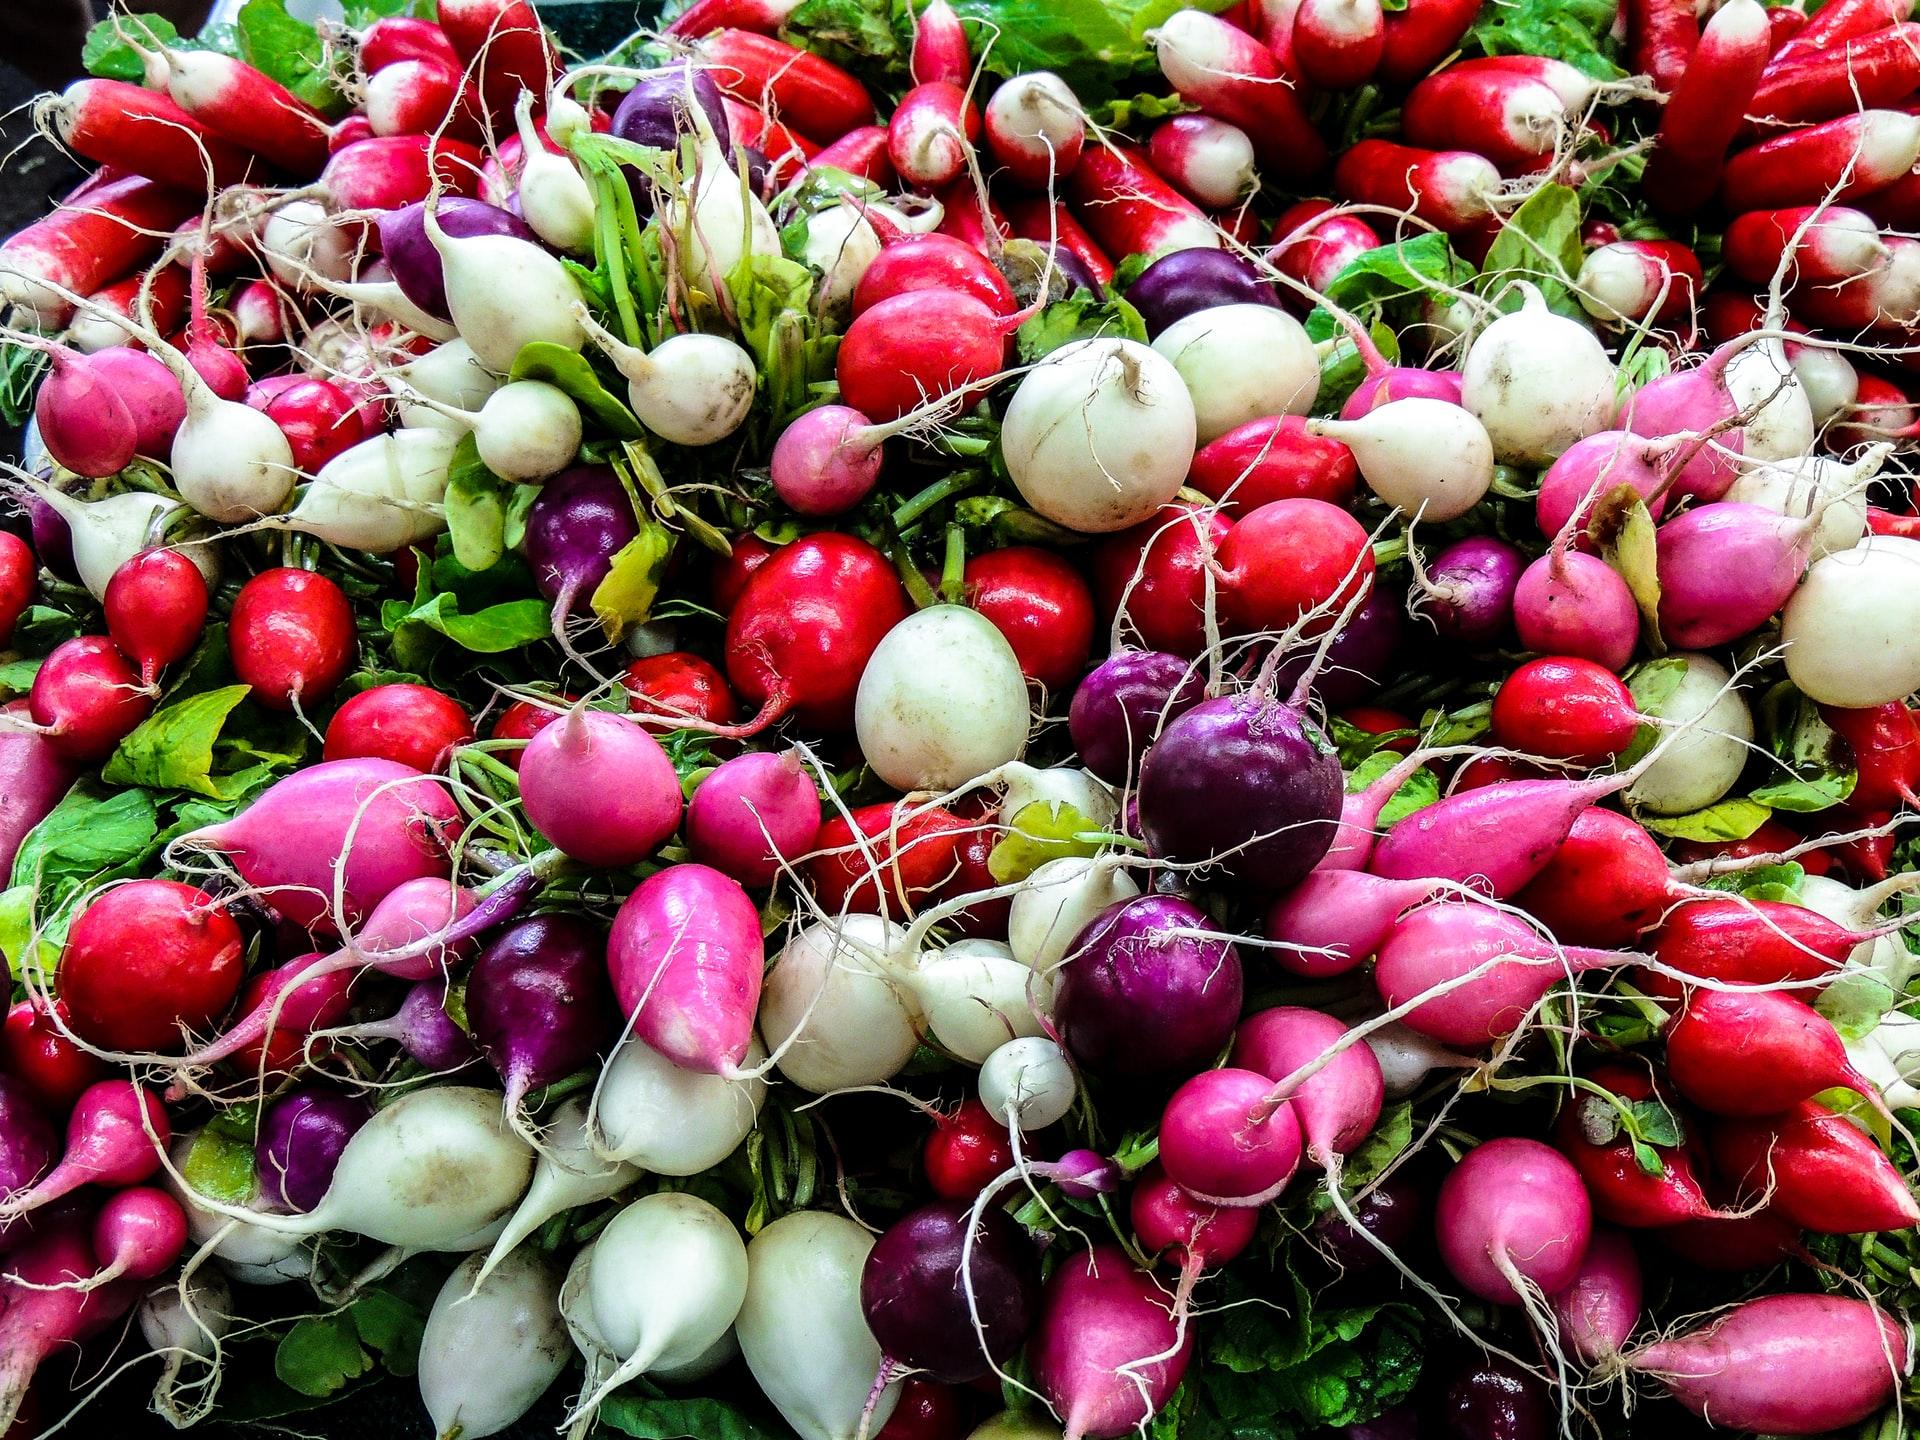 Stock Up on Seasonal Produce at Copley Square Farmers Market